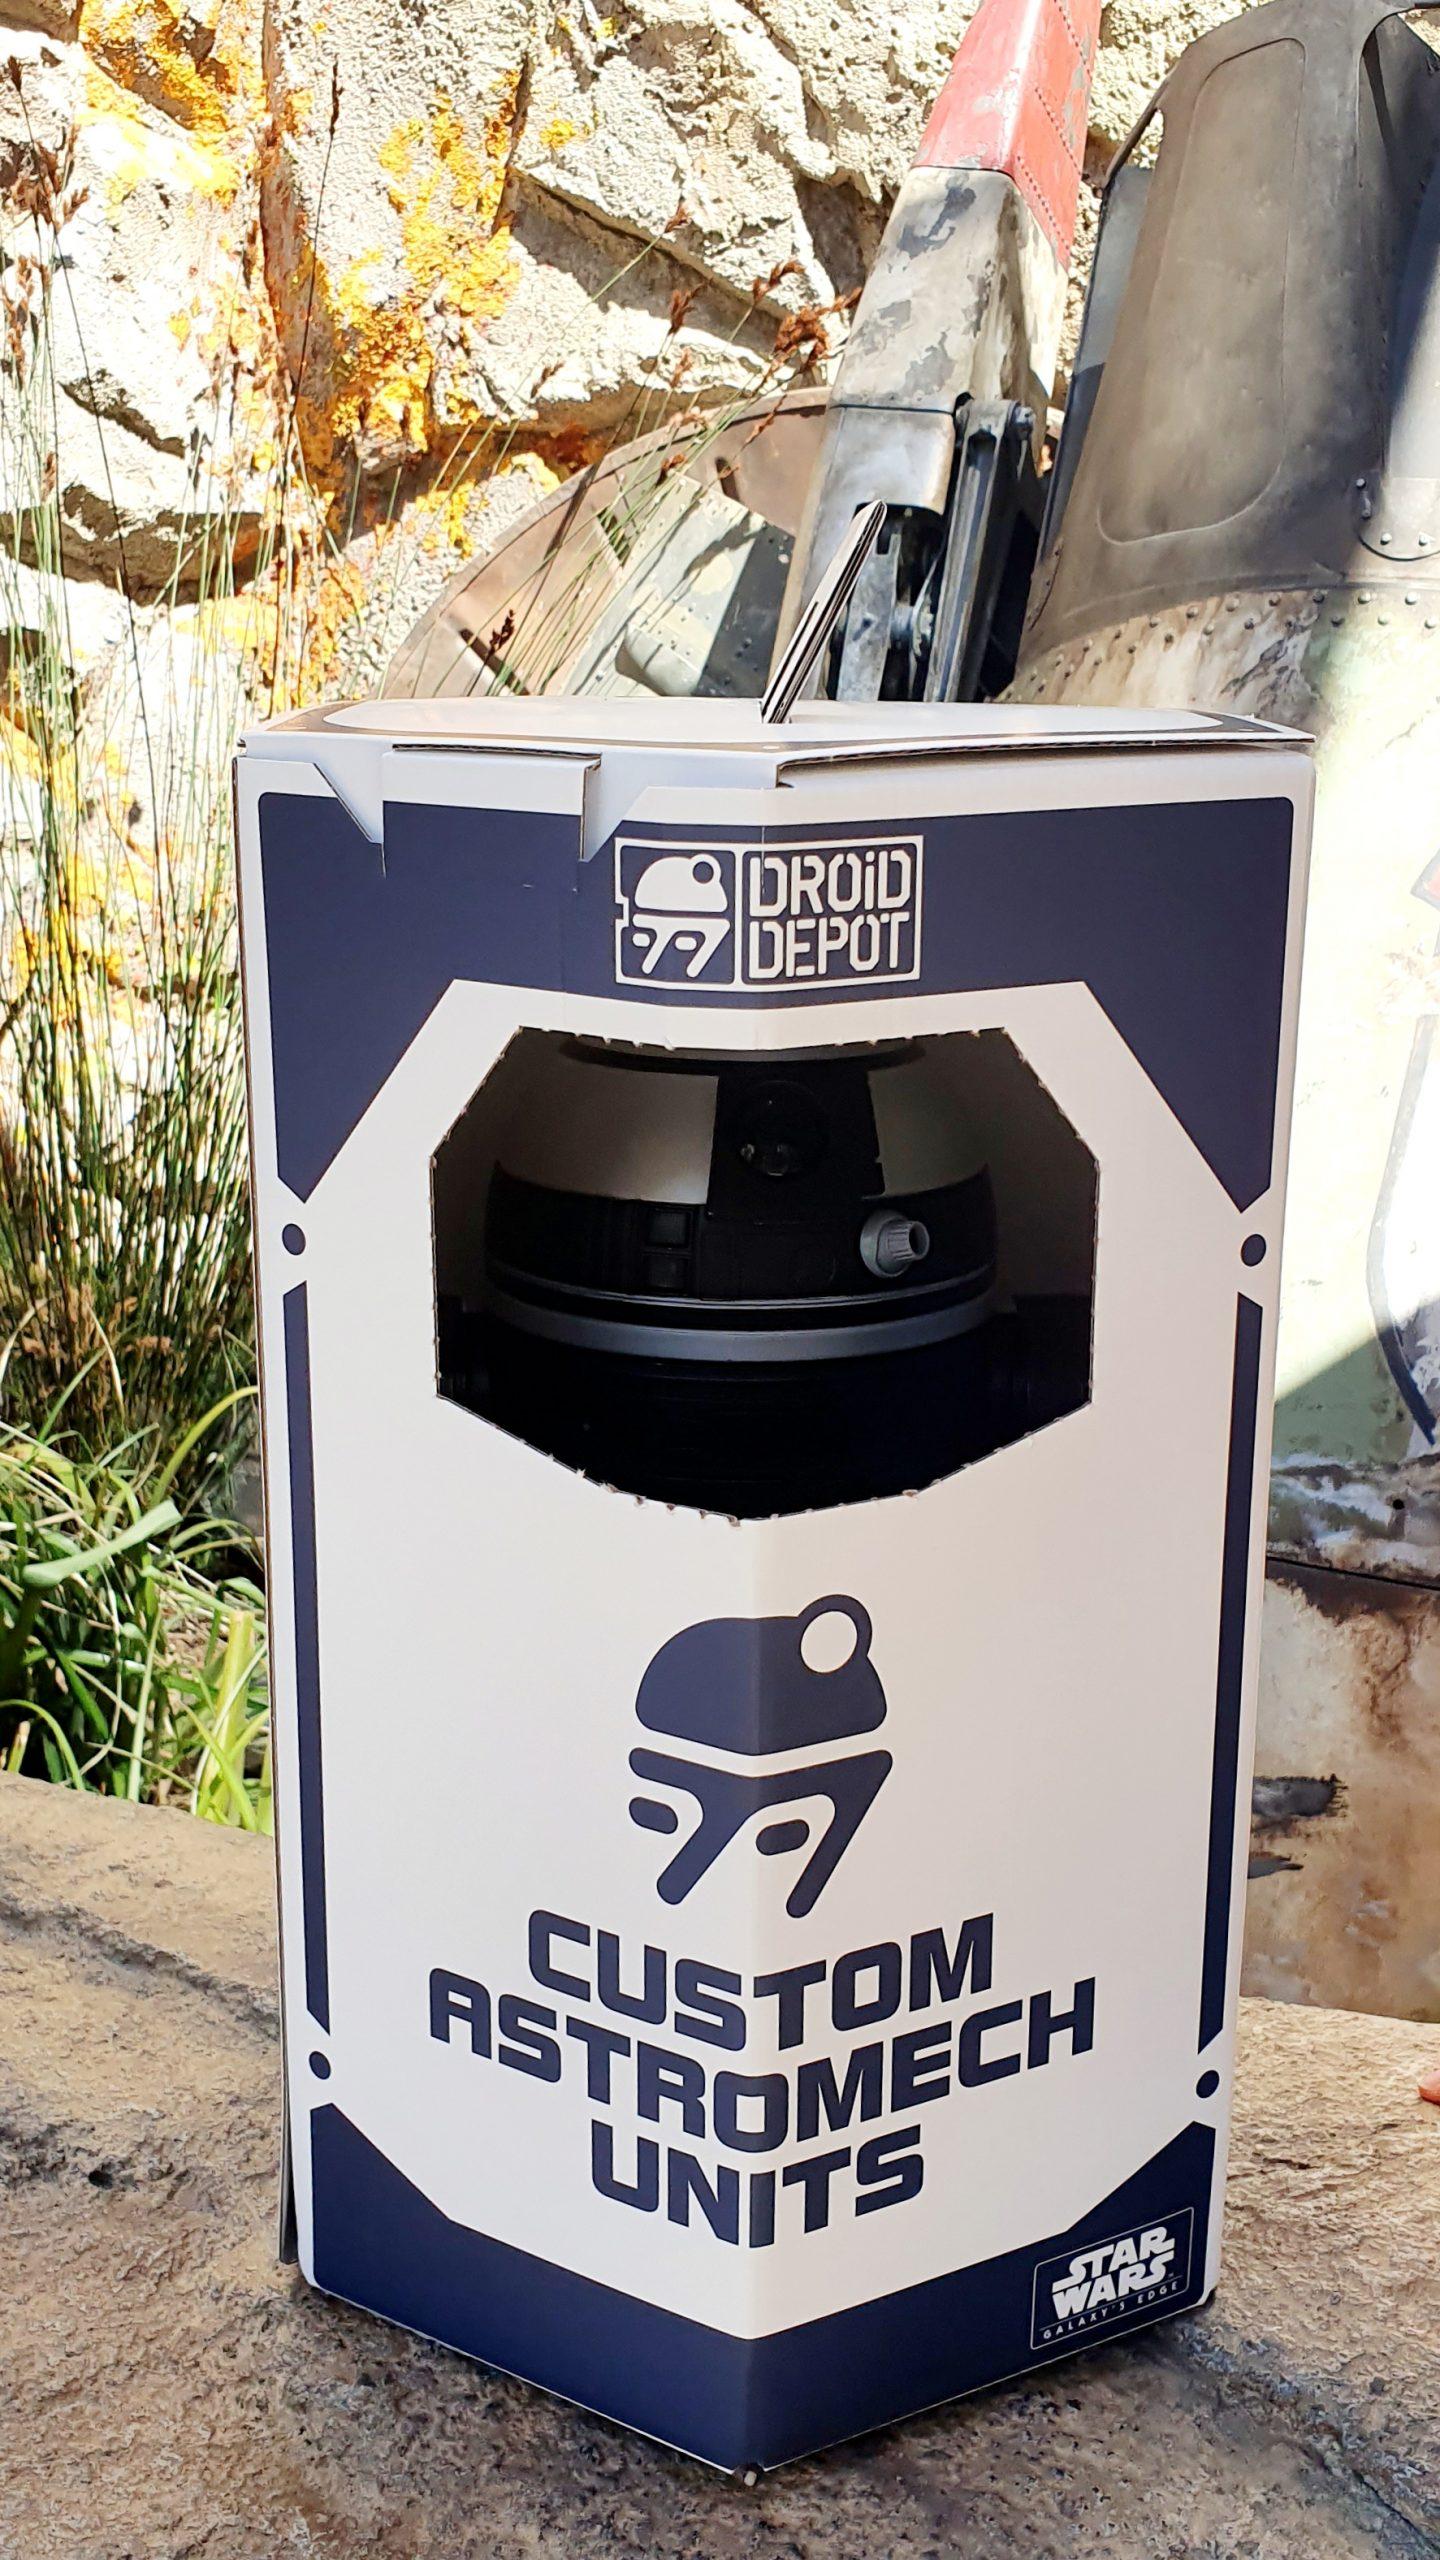 Disneyland Droid Depot